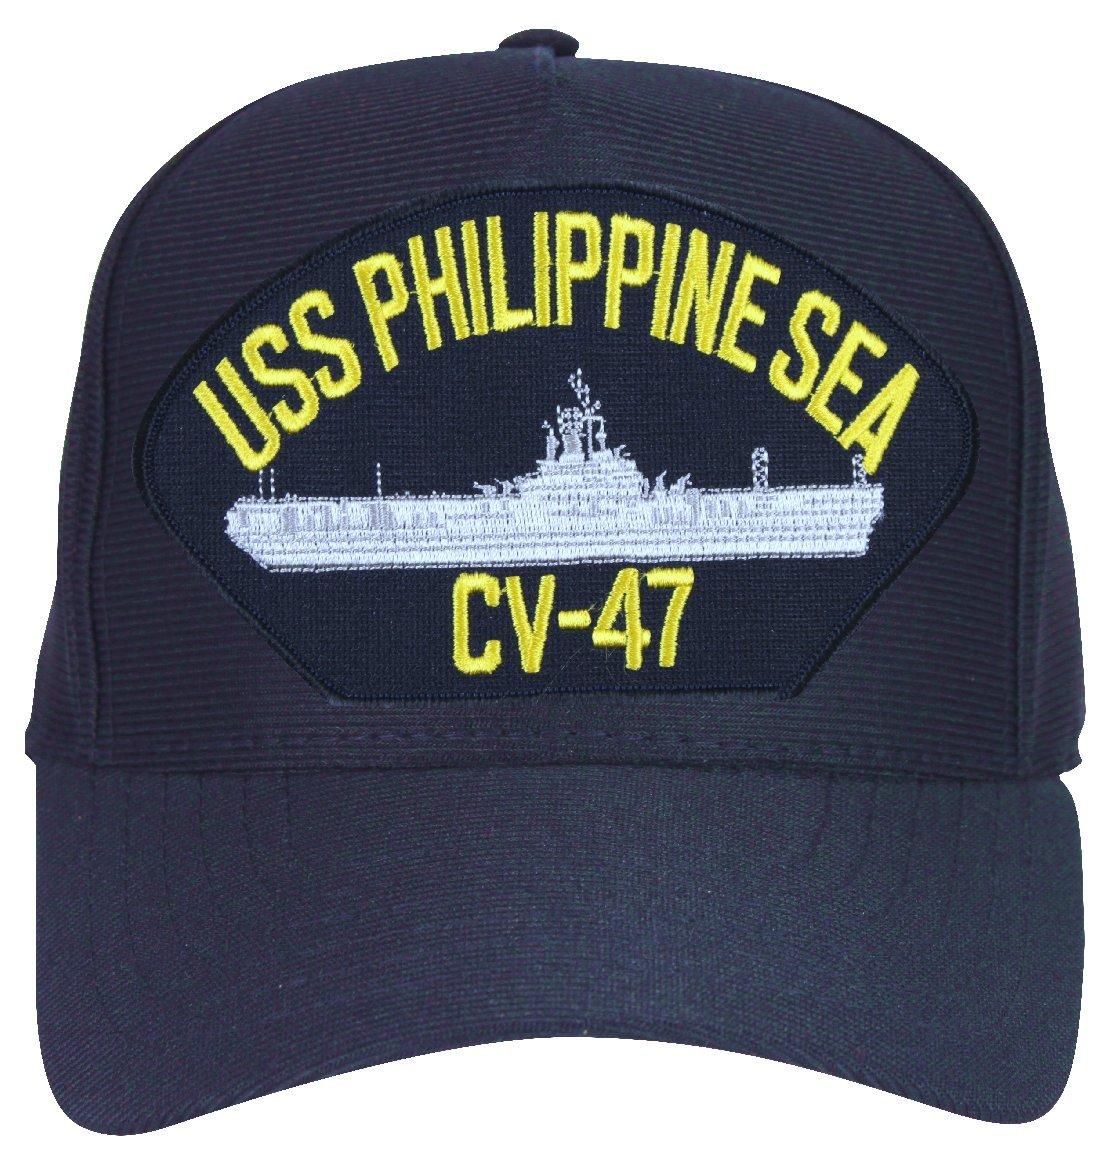 Amazon.com  MilitaryBest USS Philippine Sea CV-47 Ships Ball Cap with  Custom Back Text  Sports   Outdoors 33032448ef1